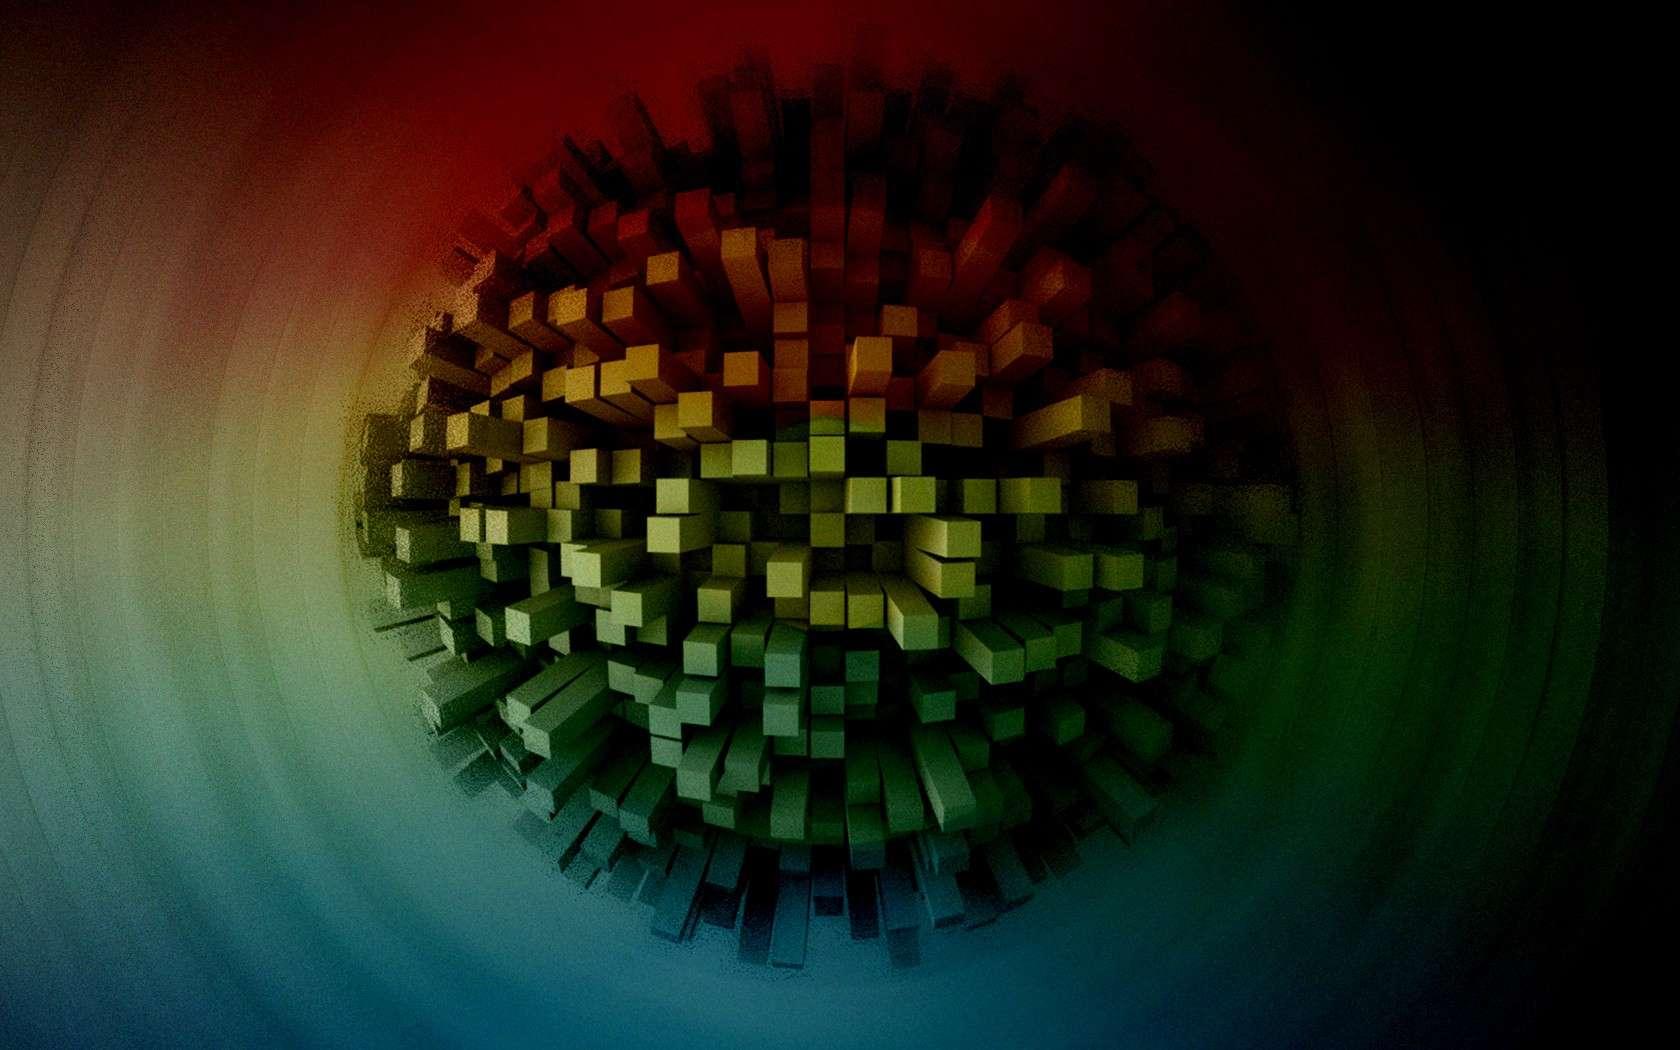 3D Abstract CGI Wallpaper 140